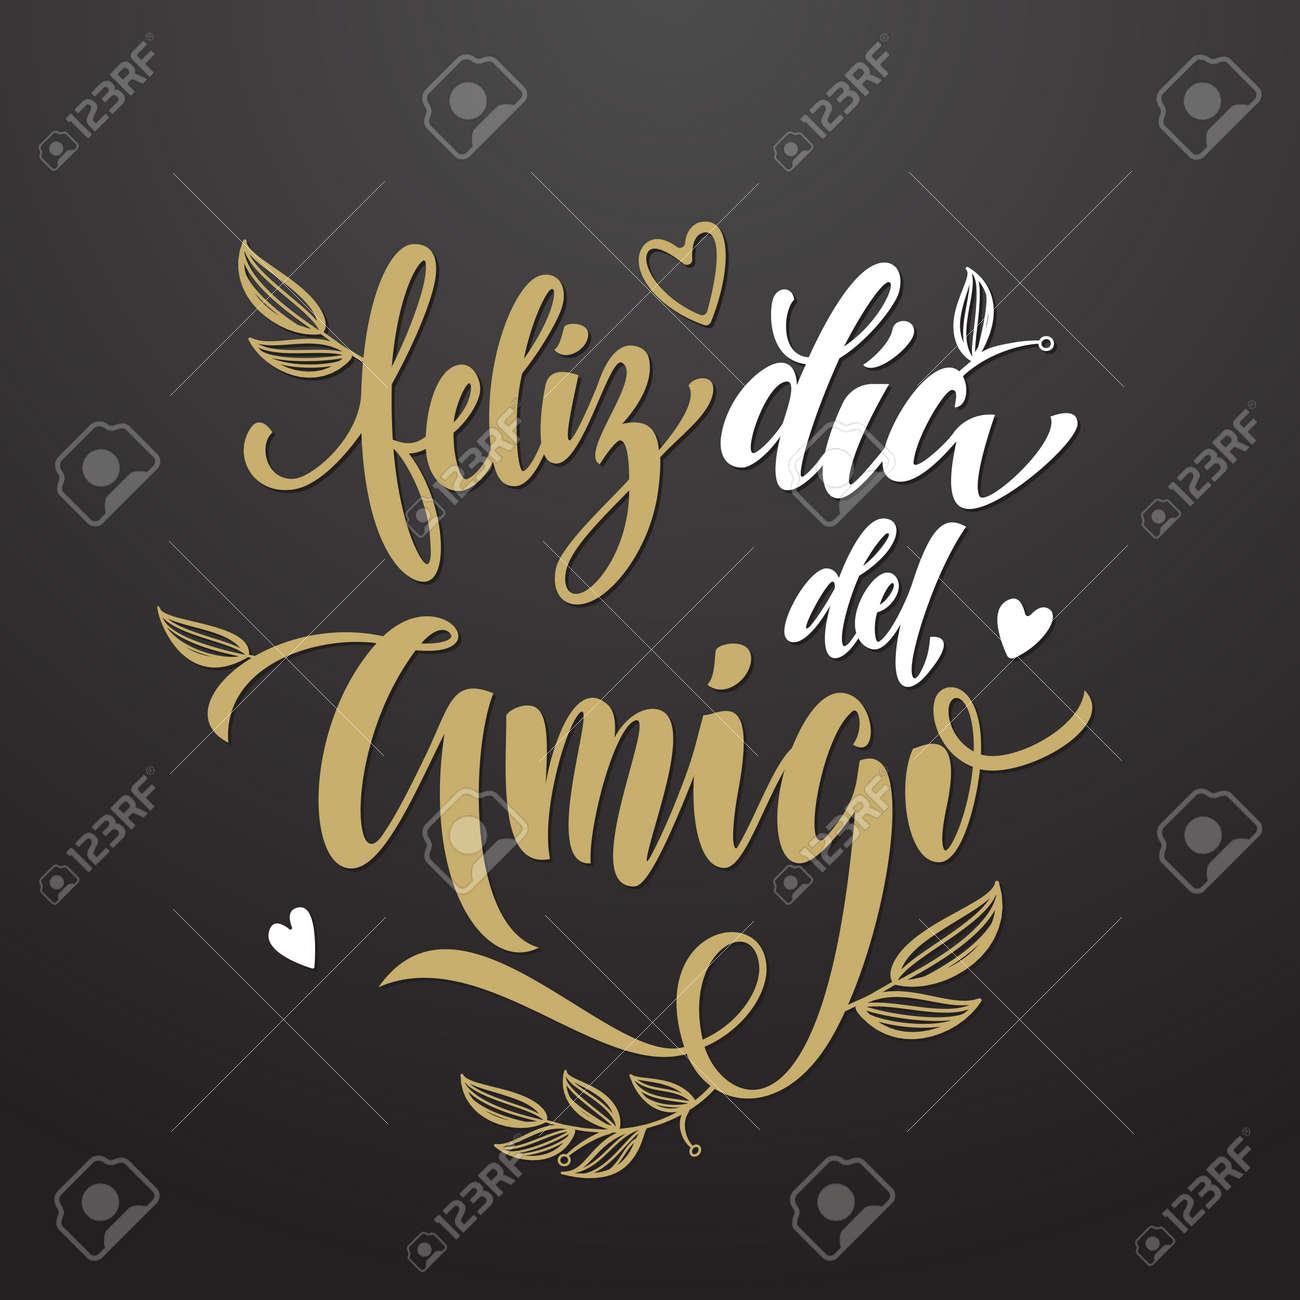 Feliz Dia Del Amigo Friendship Day Lettering In Spanish For Friends Greeting Card Hand